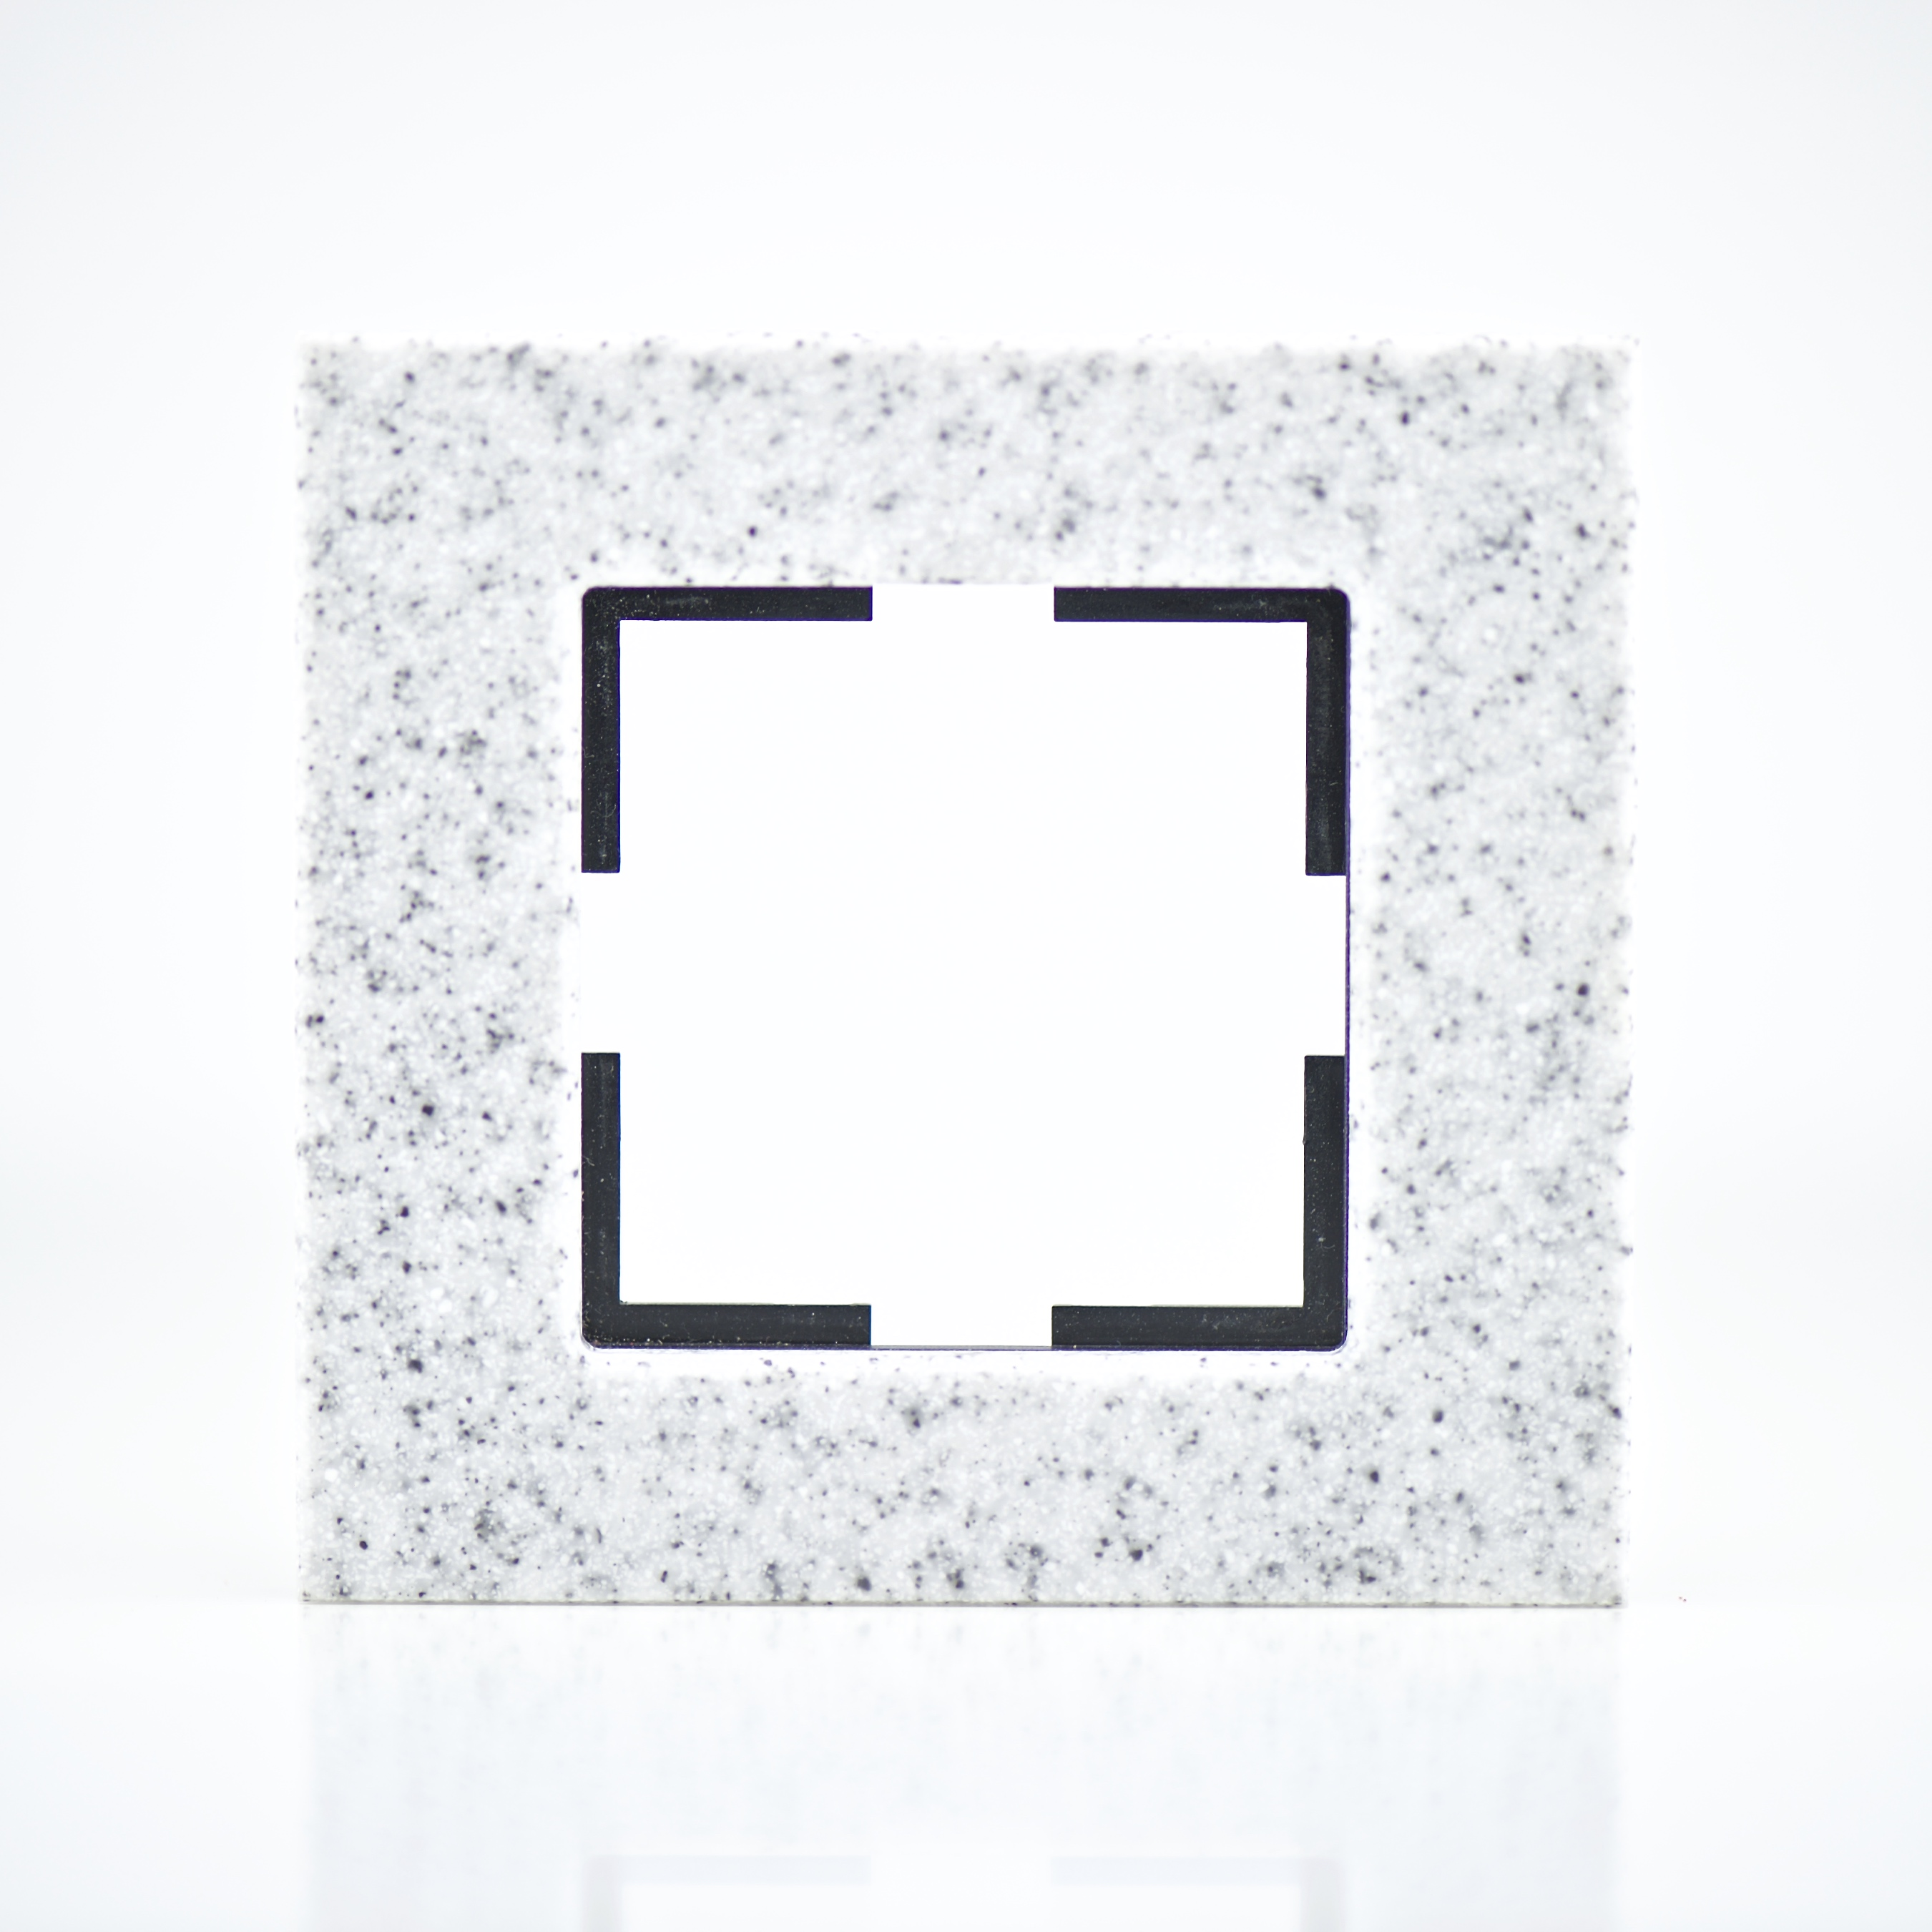 plaque de finition simple corian cr puscule top prix. Black Bedroom Furniture Sets. Home Design Ideas